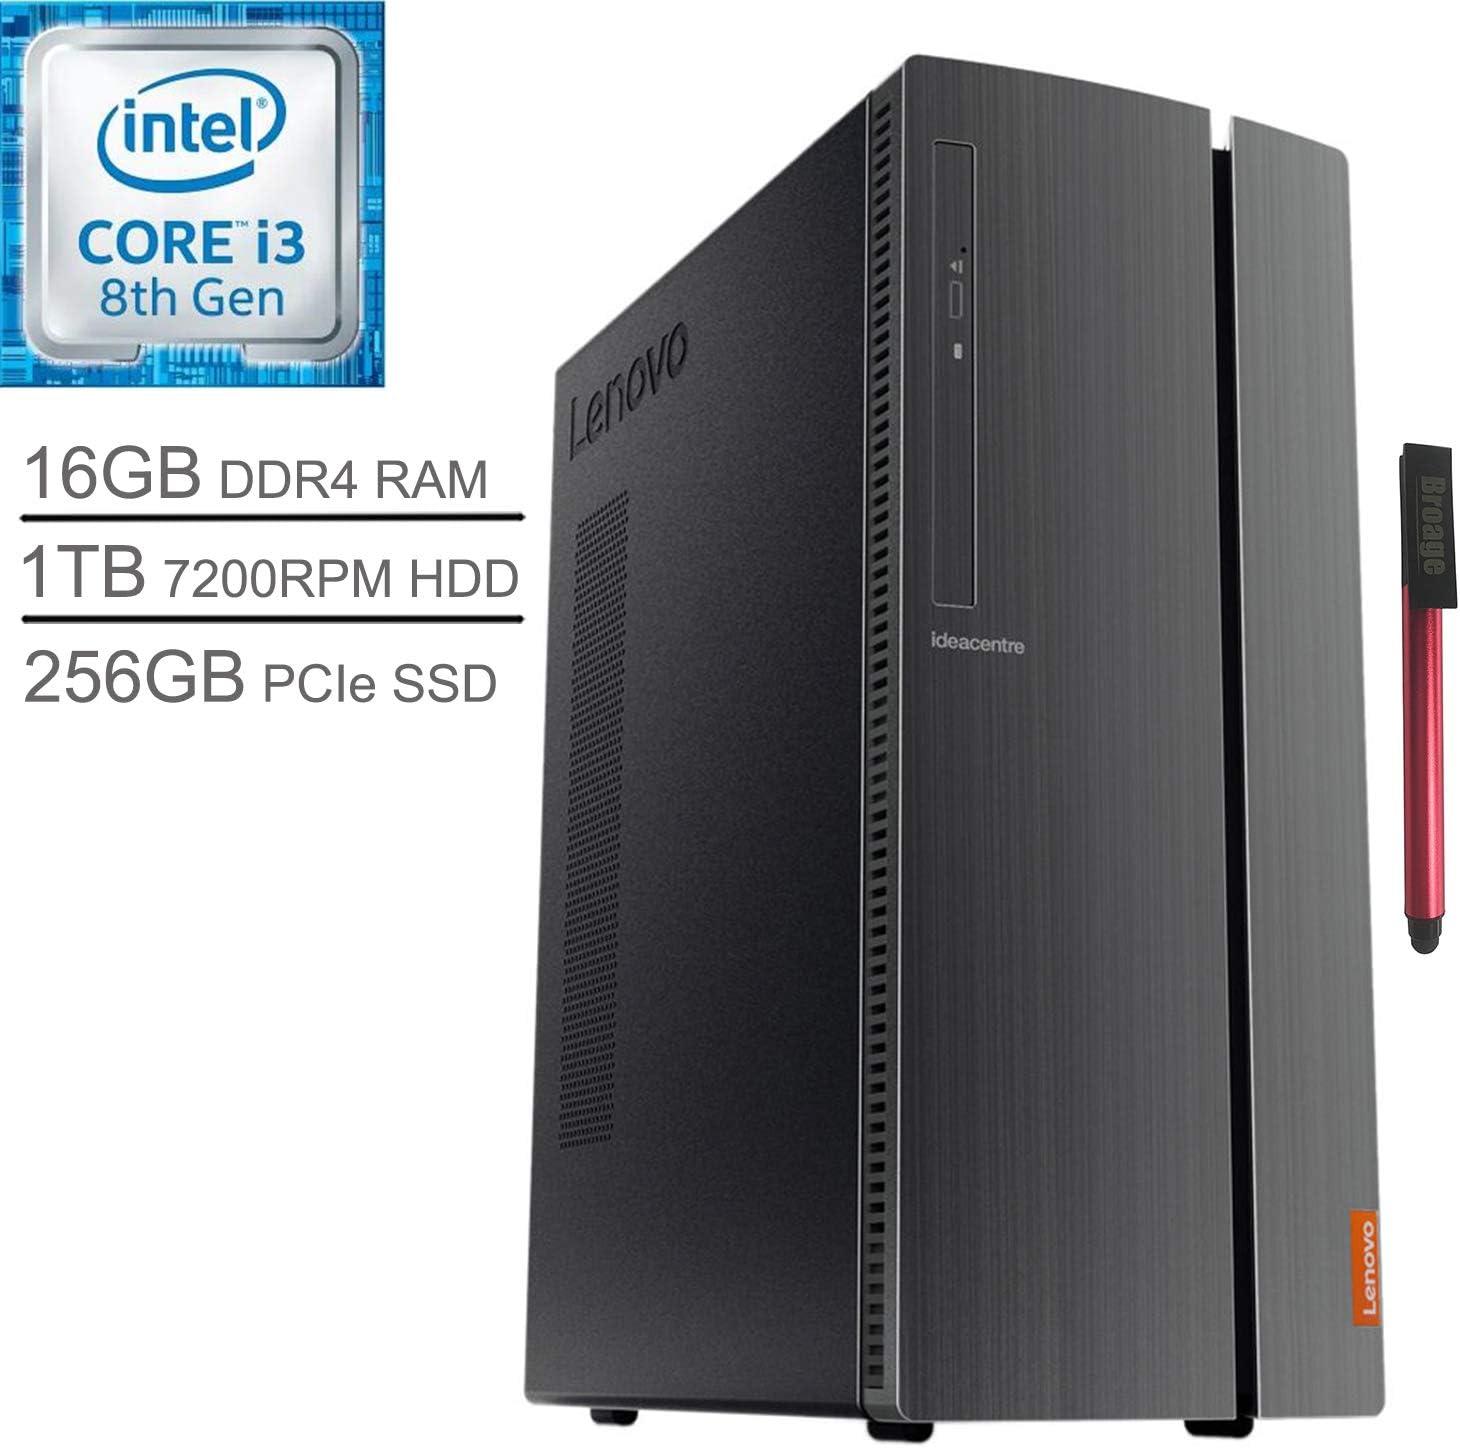 Lenovo IdeaCentre 510A Desktop Computer_ Intel Quad-Core i3-8100 3.6GHz (Beats i5-7500)_ 16GB DDR4 RAM_ 1TB 7200RPM HDD + 256GB PCIe SSD_ DVDRW_ 802.11AC WiFi_ Windows 10_ BROAGE 64GB Flash Drive